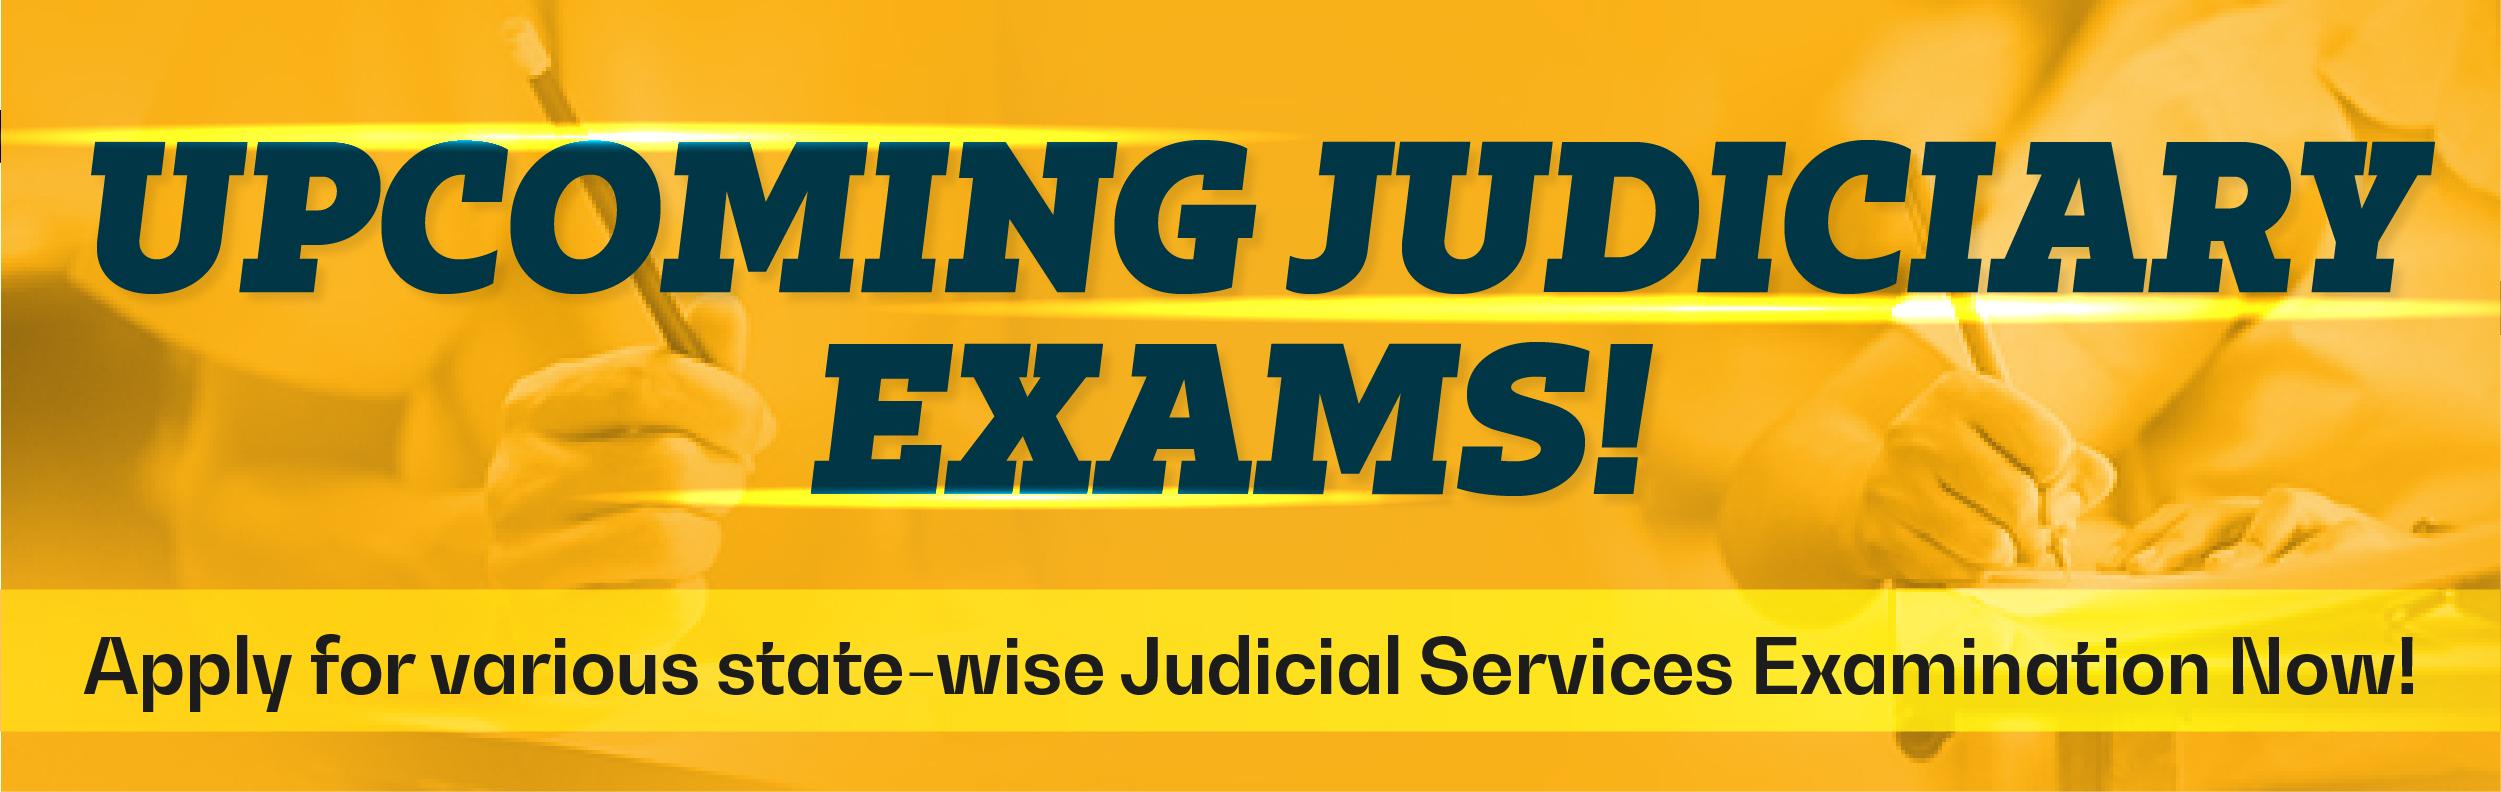 Judiciary Exams